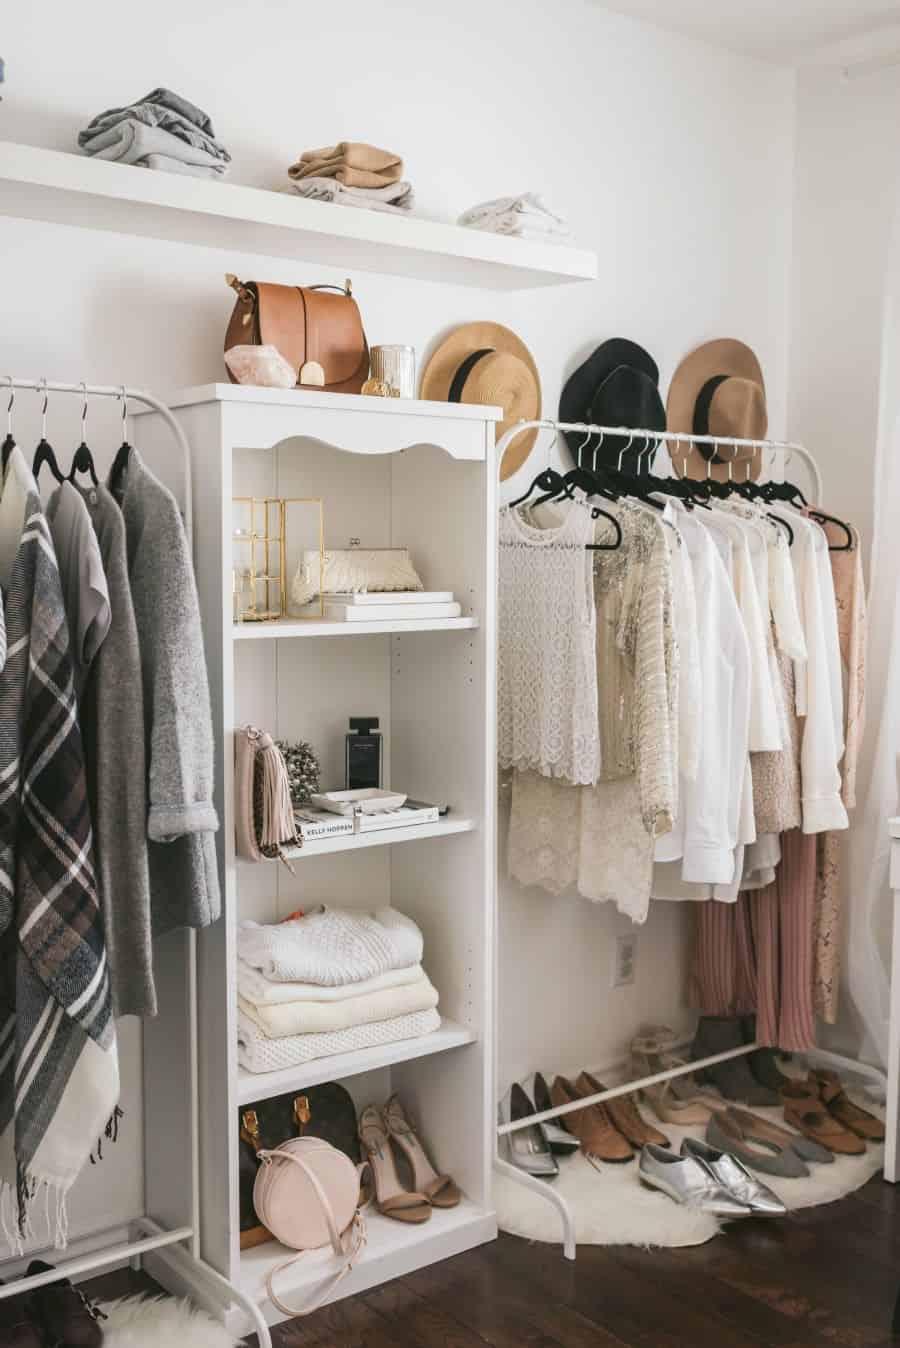 Stylish no-closet wardrobe